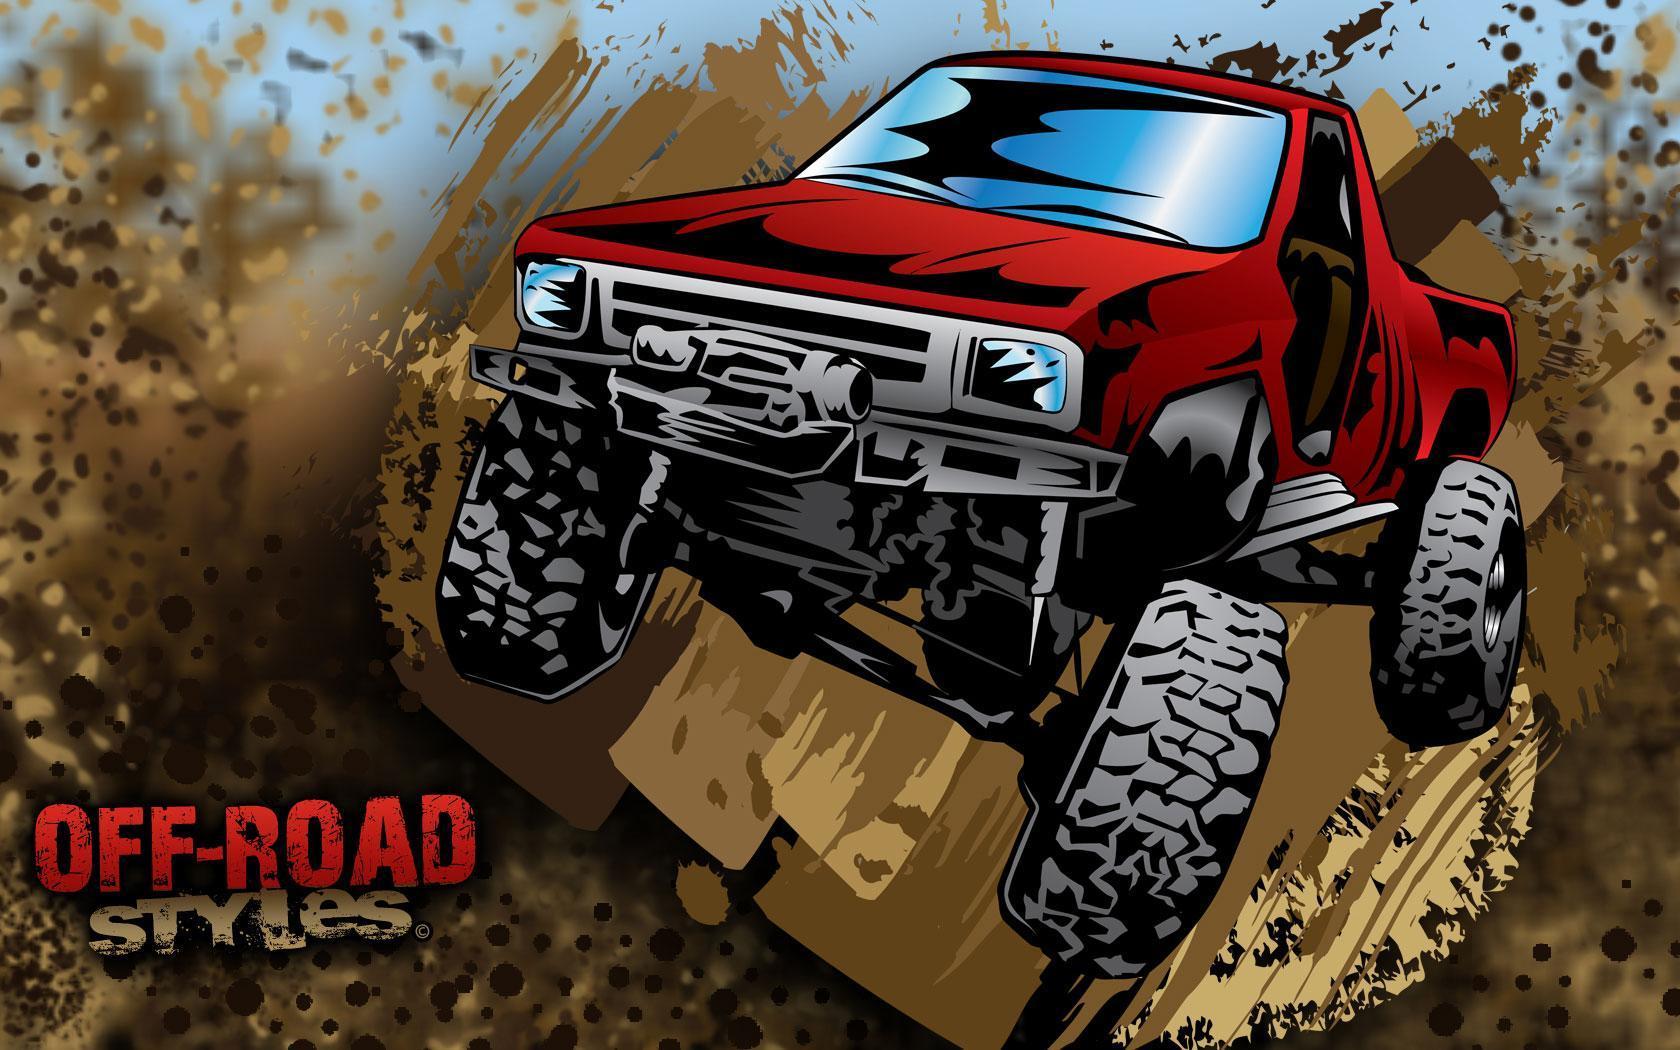 offroadstyles-muddy-red-4x4-truck.jpg